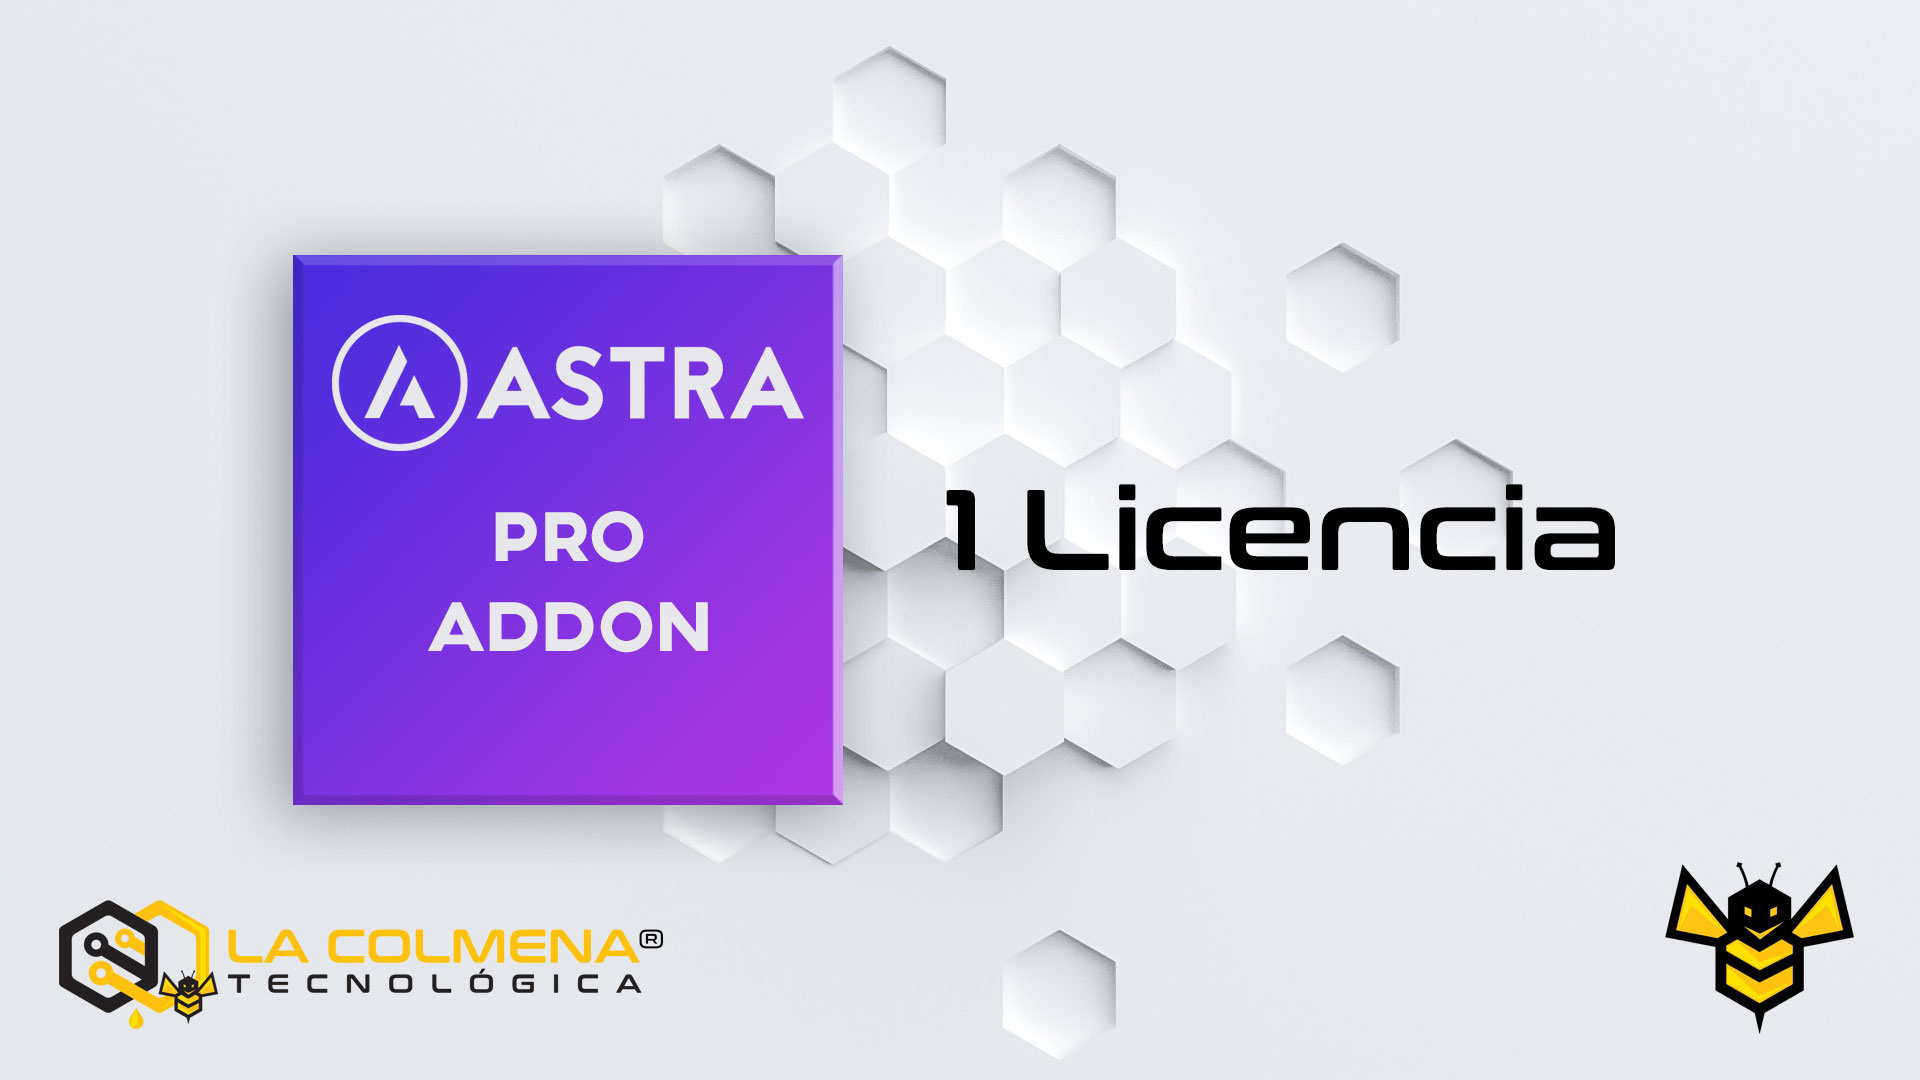 1 Licencia de Astra Pro Addon